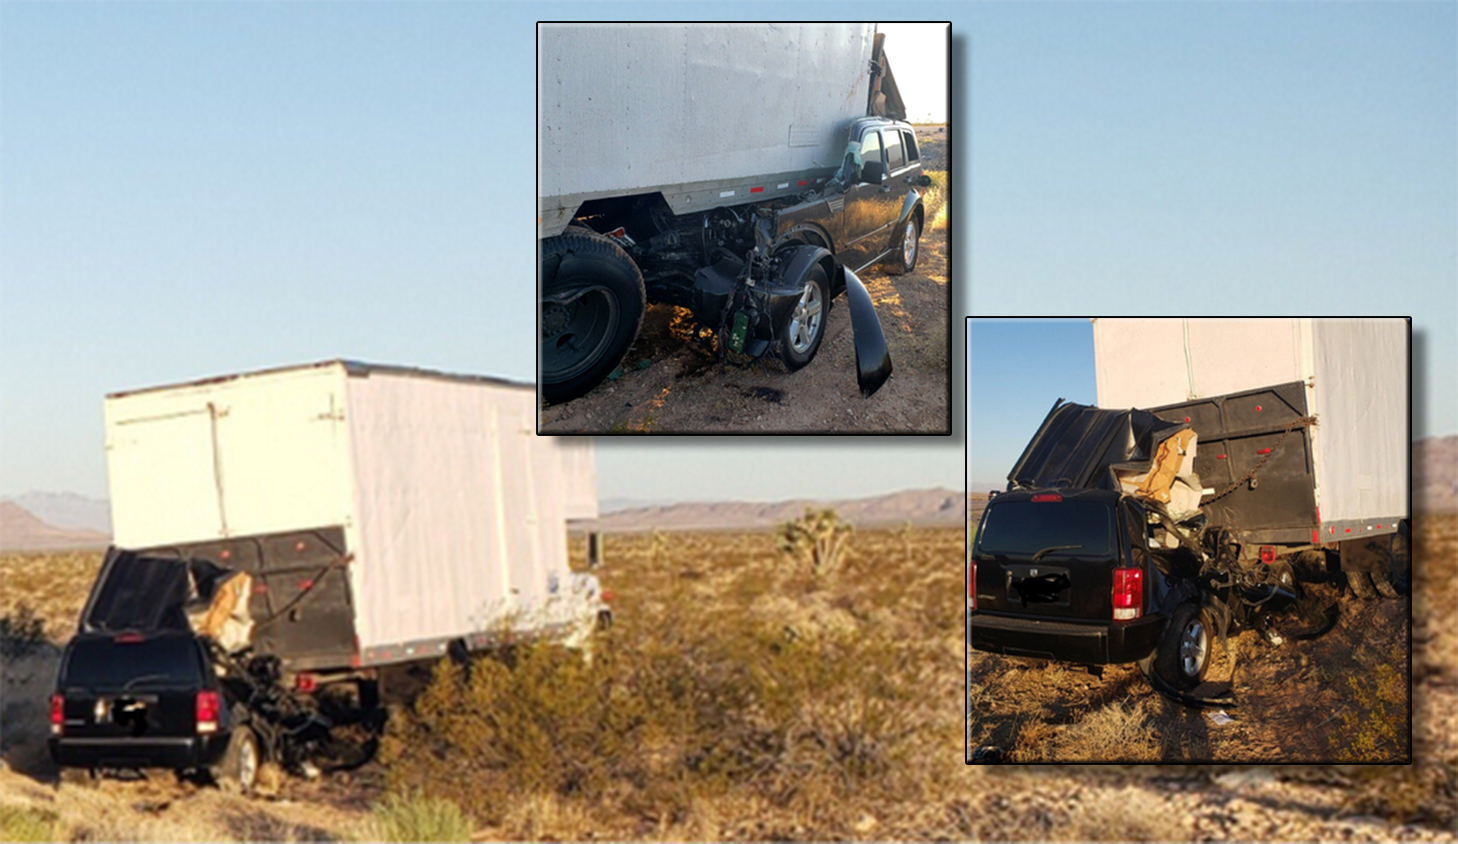 Fatal crash on I-15 near Mesquite | KLAS - 8 News Now